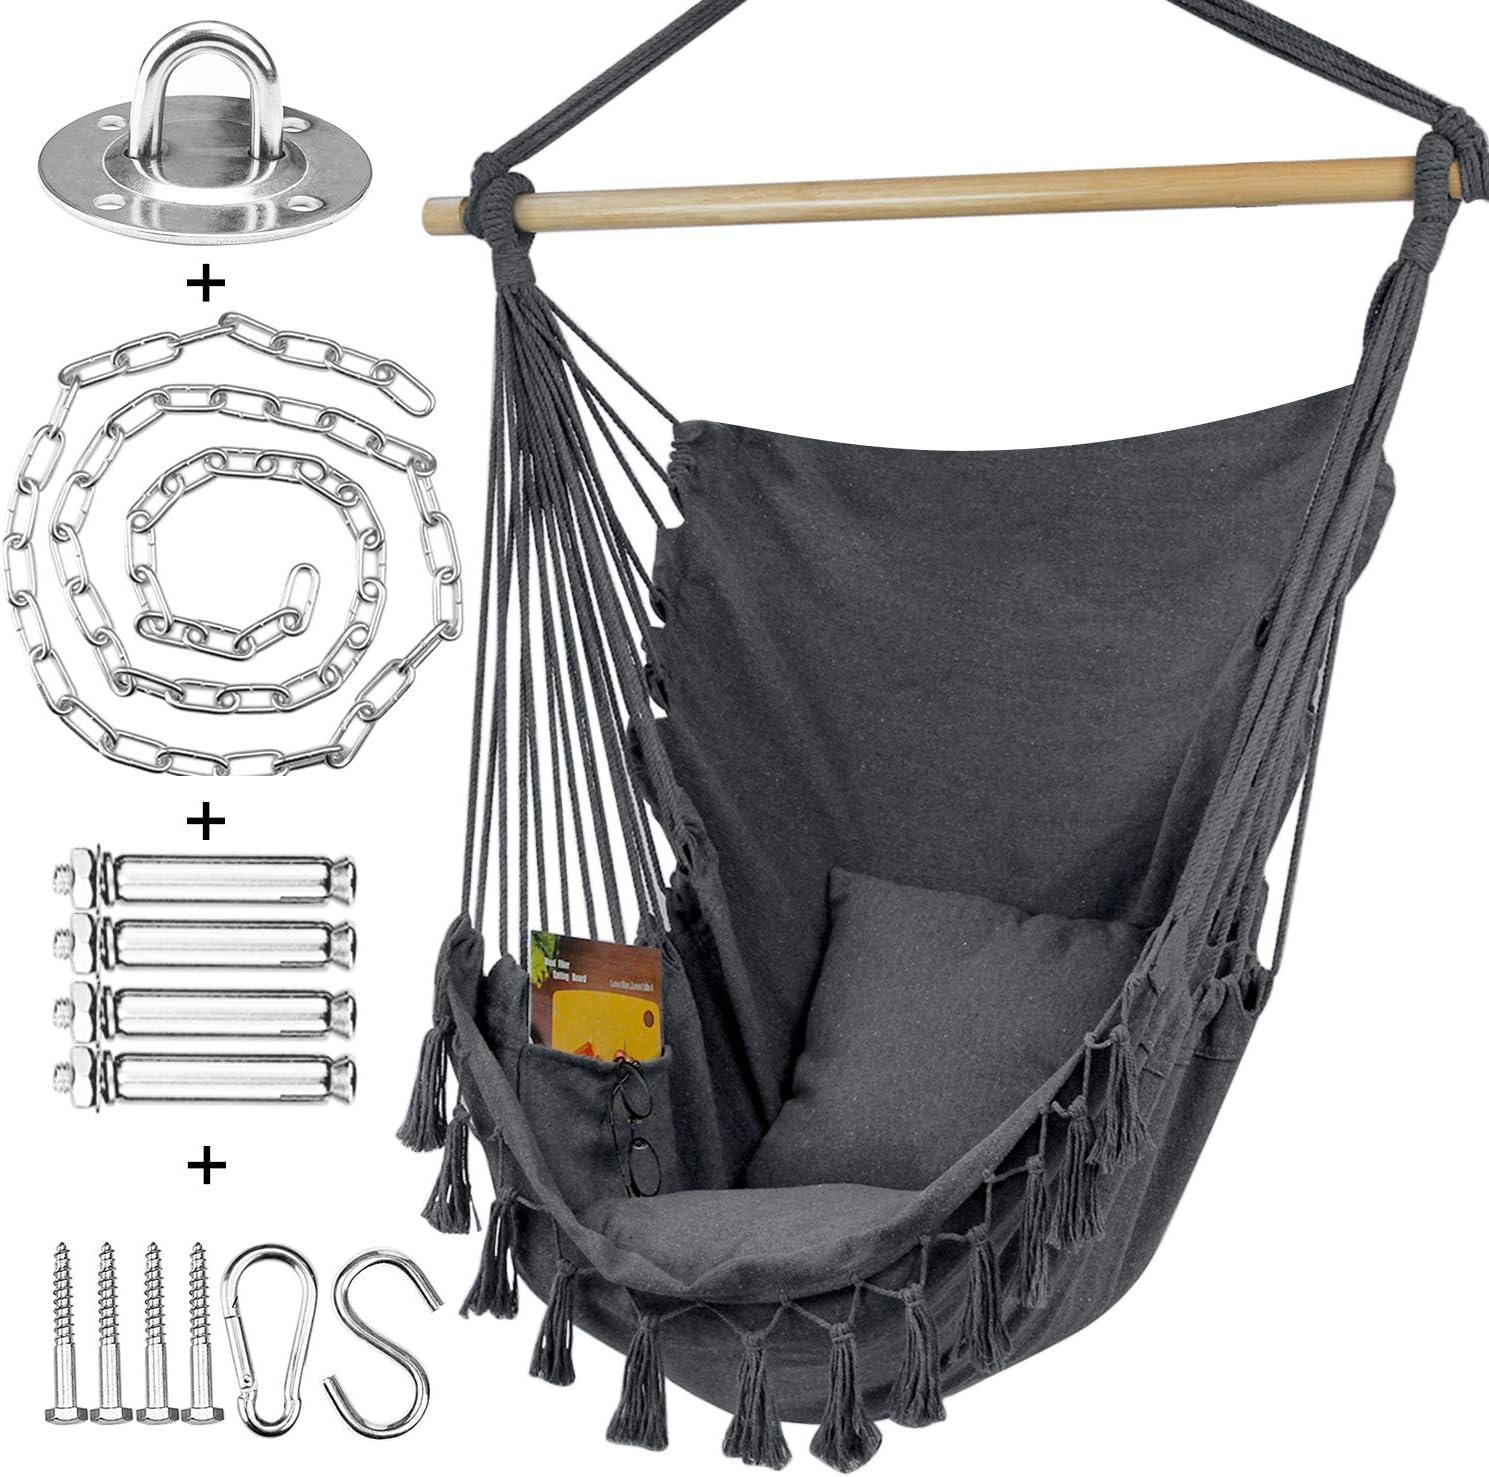 Hammock Chair Swing with Hanging Hardware Kit